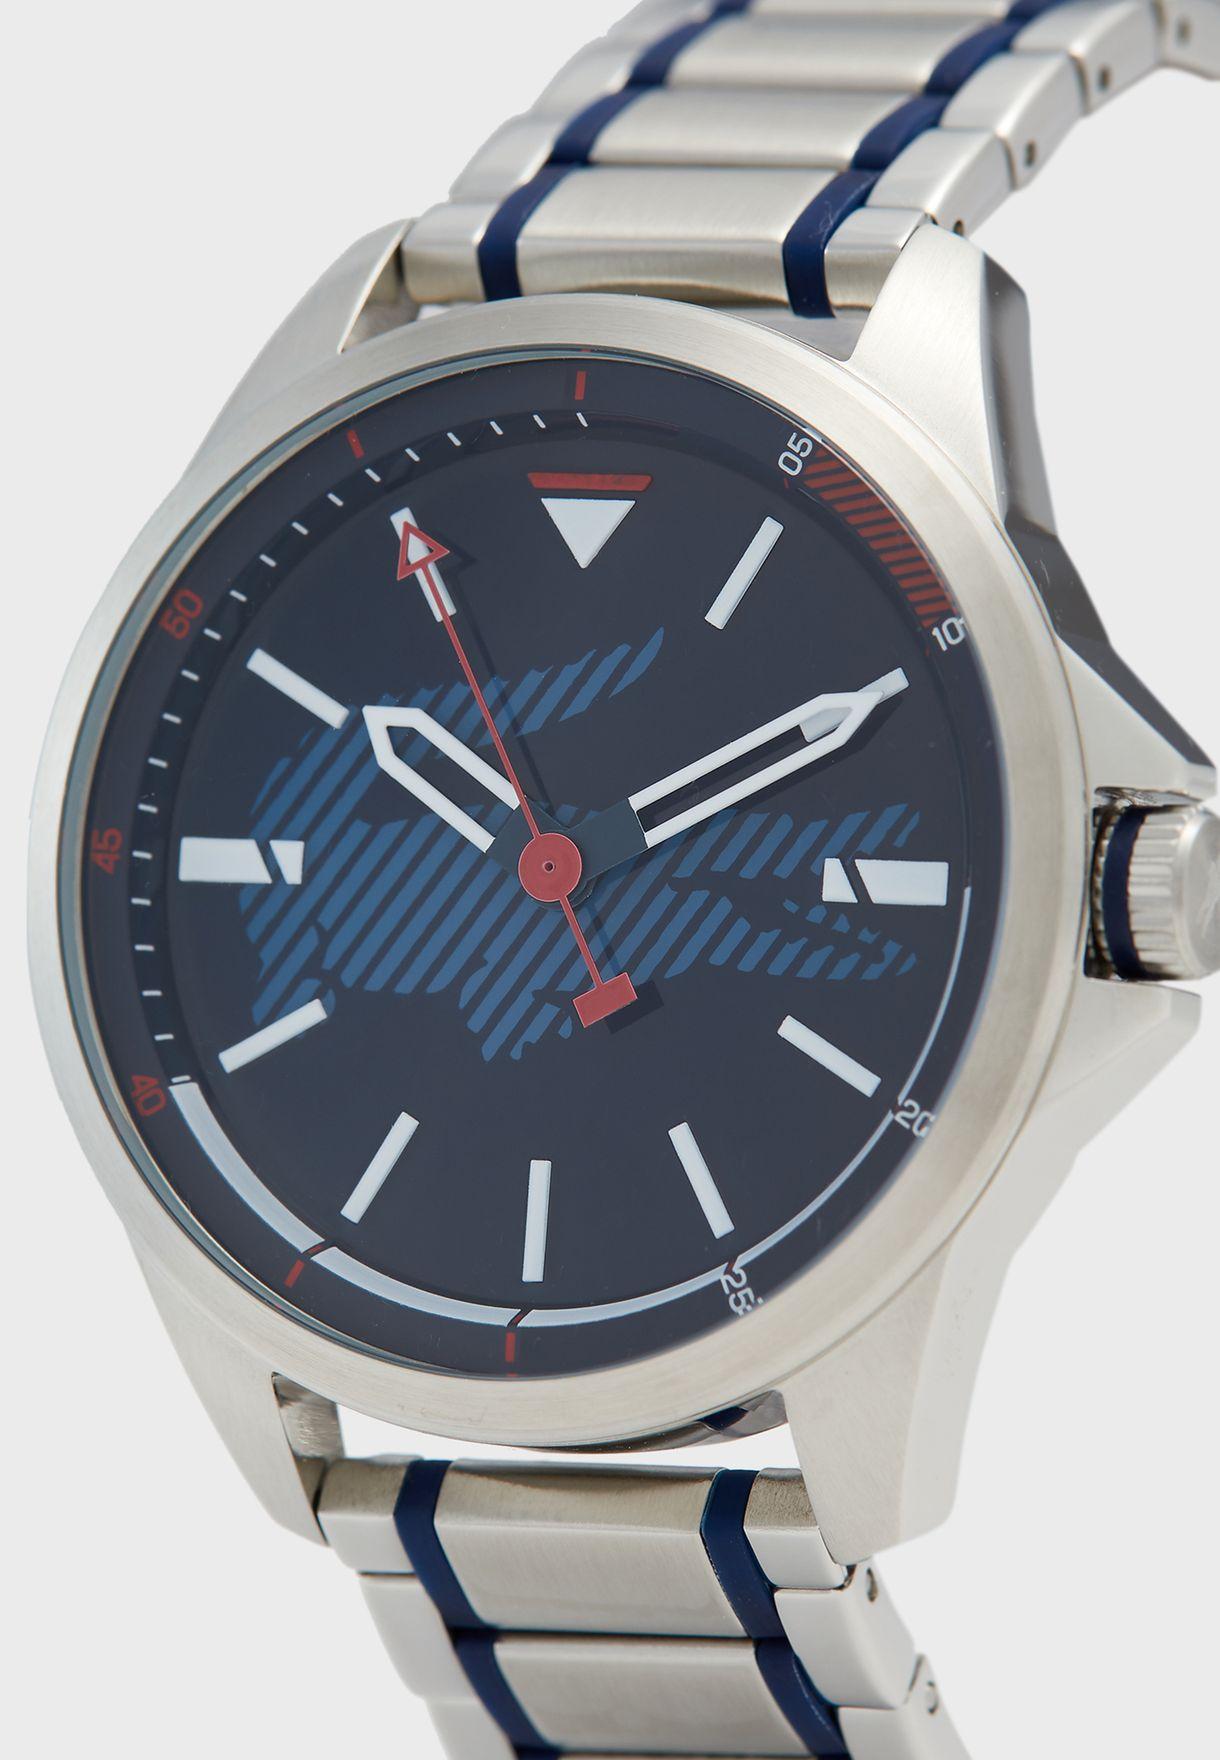 2010944 Capbreton Watch